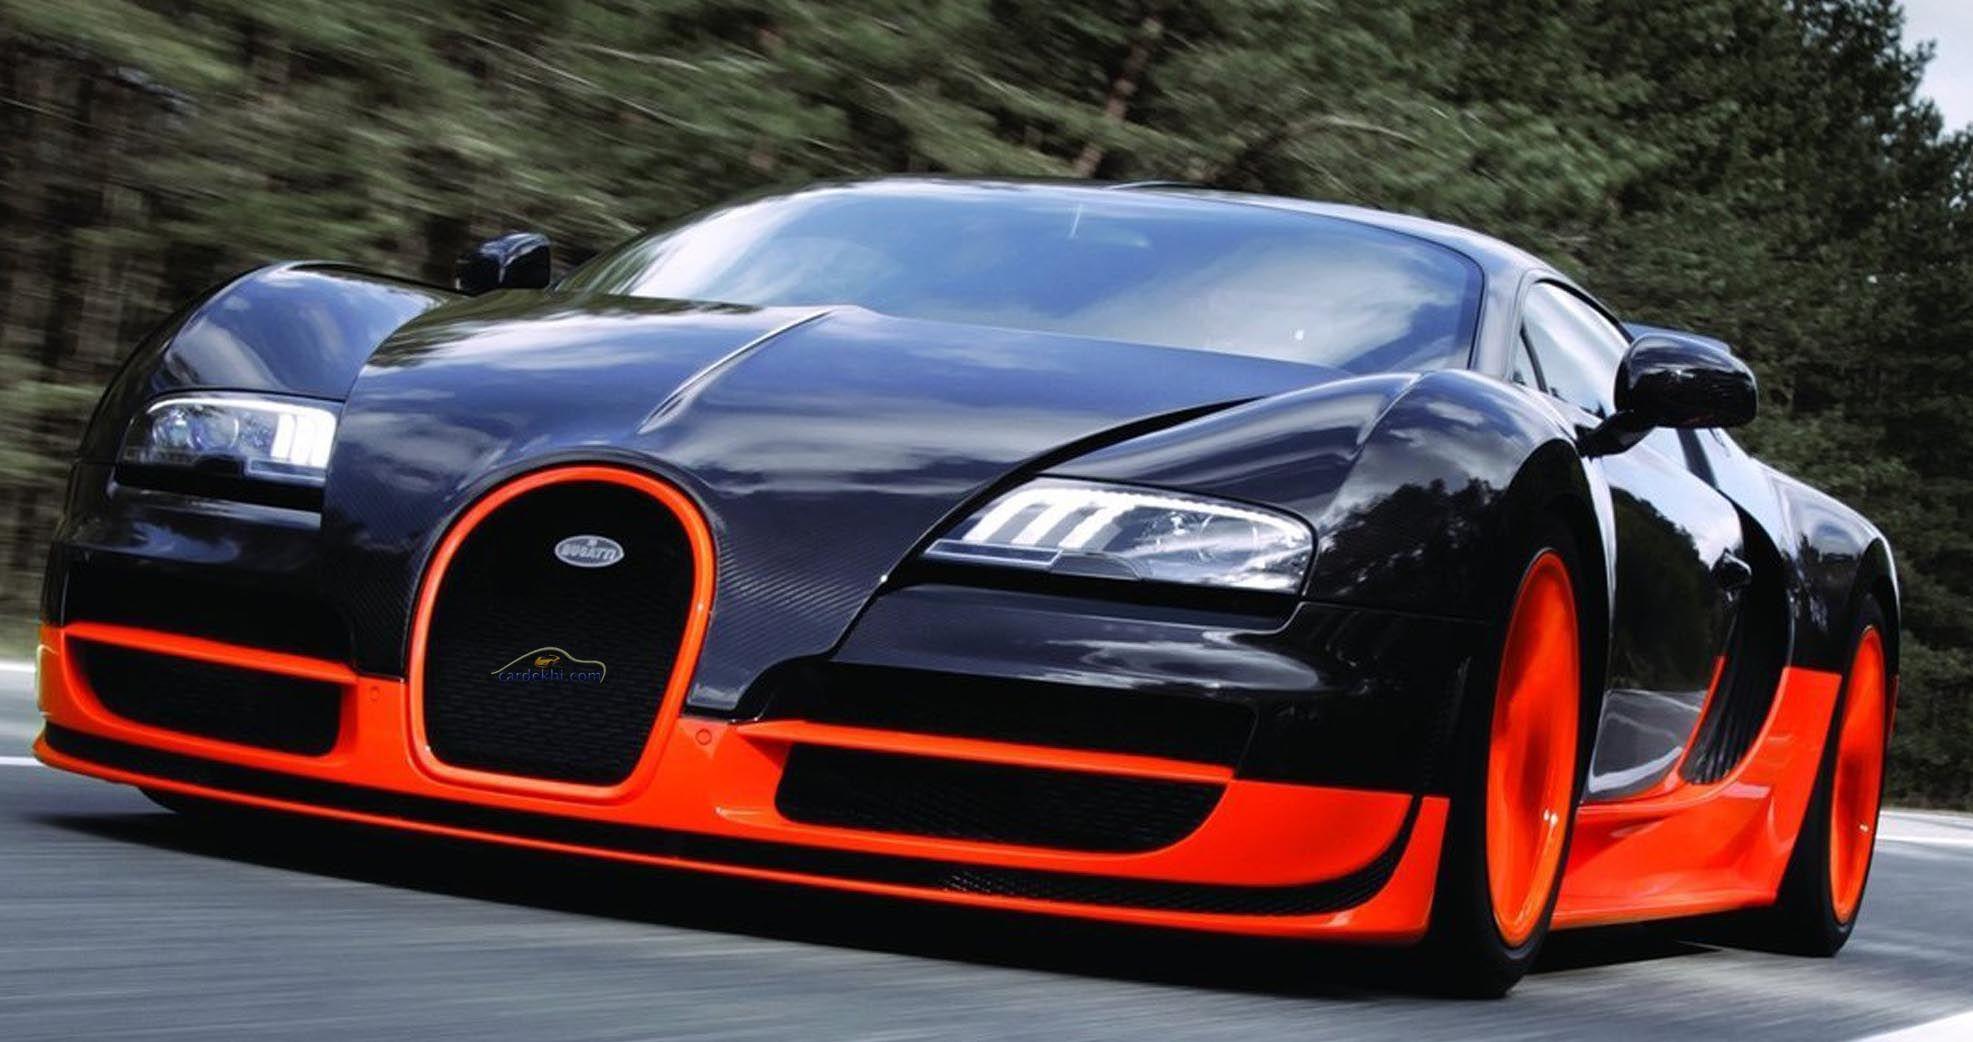 top_10_fastest_cars_in_the_world_1_bugatti_veyron_super